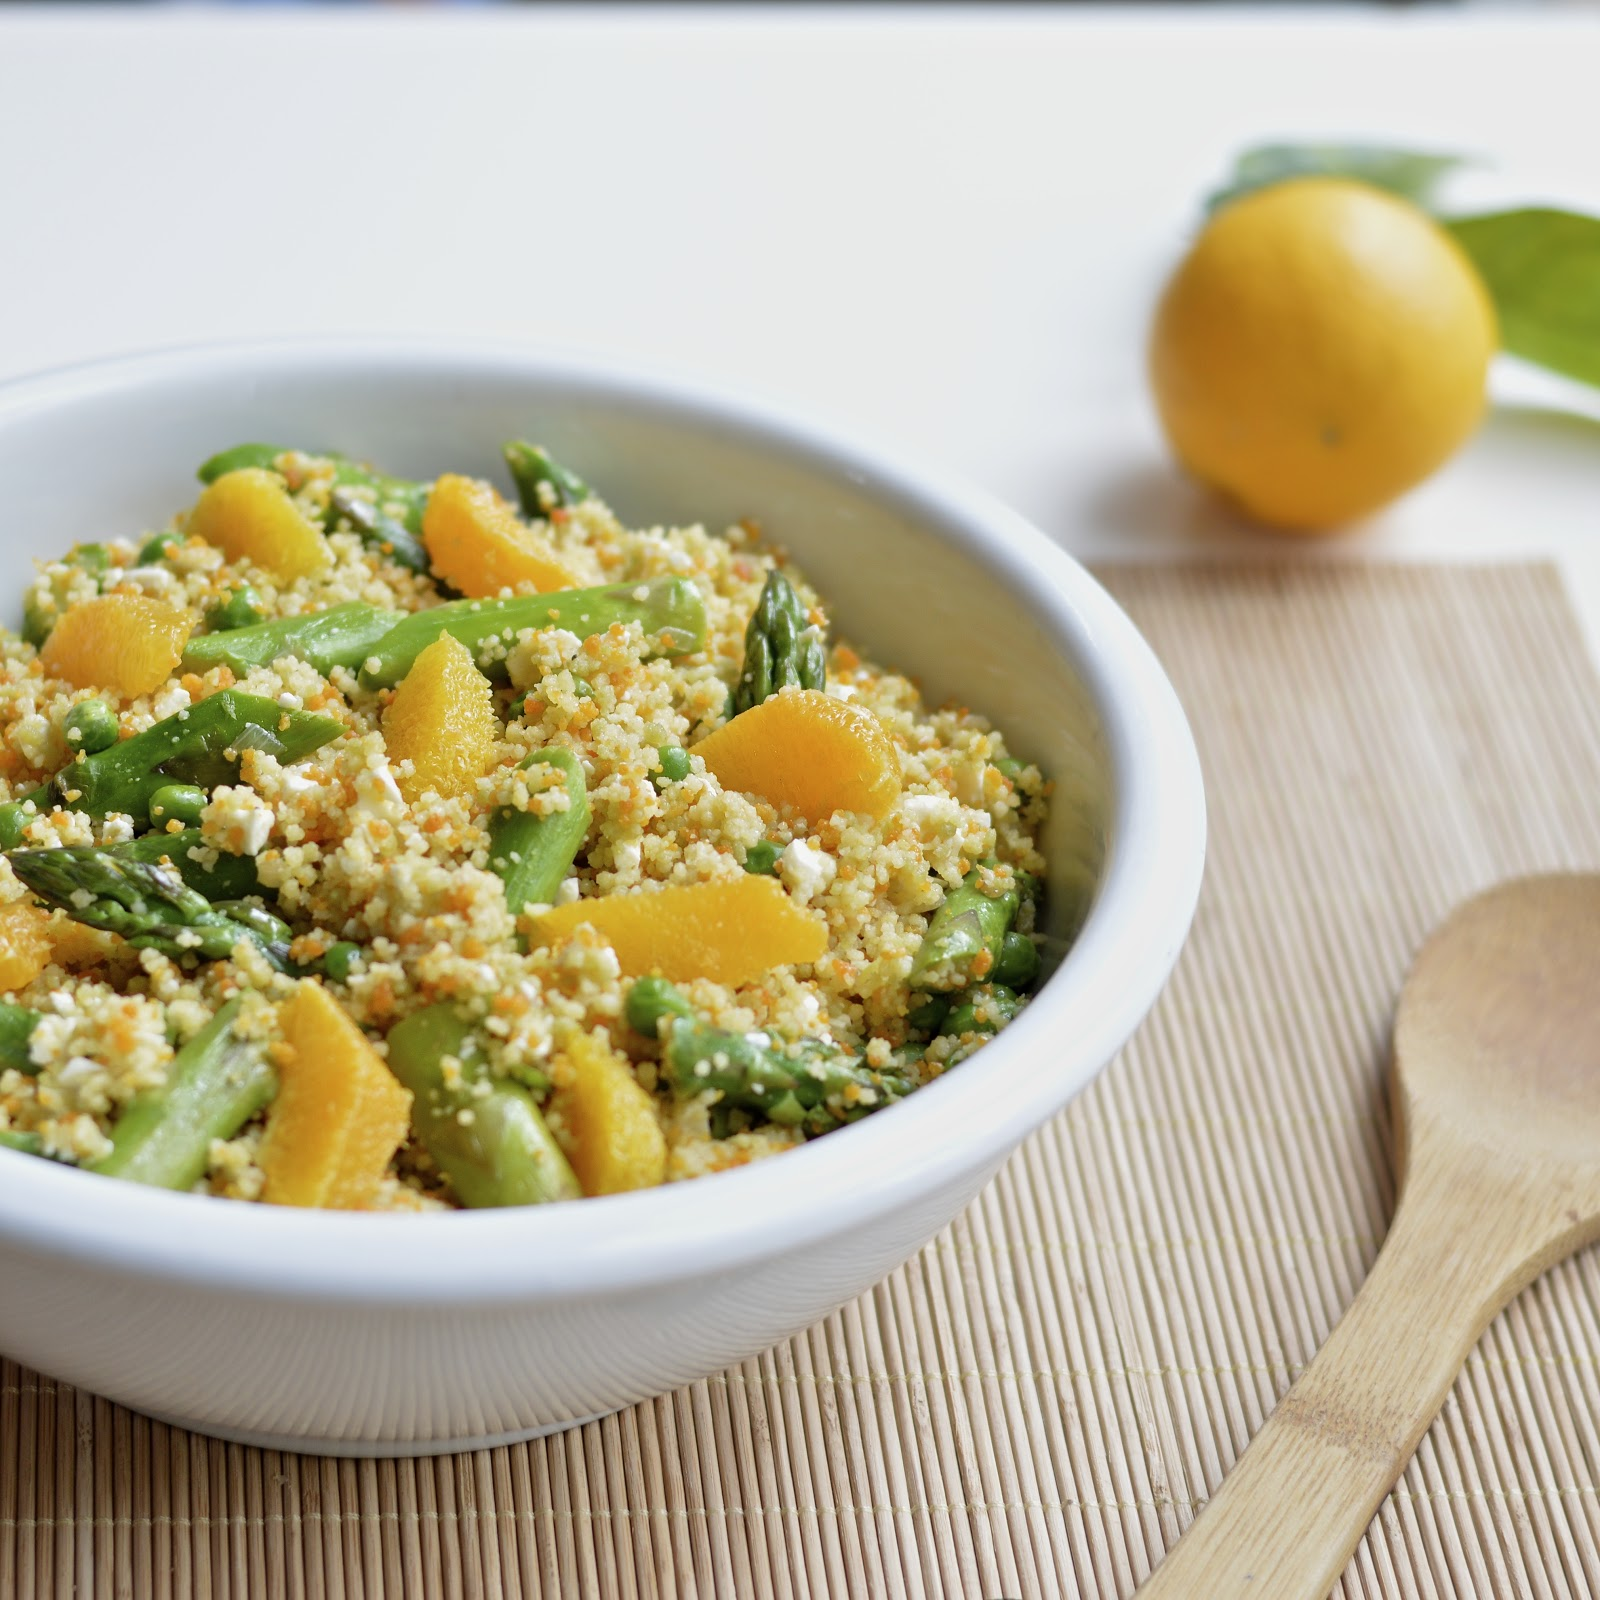 Coucous Salad Spring couscous salad with a citrus vinaigrette virtually homemade spring couscous salad with a citrus vinaigrette sisterspd